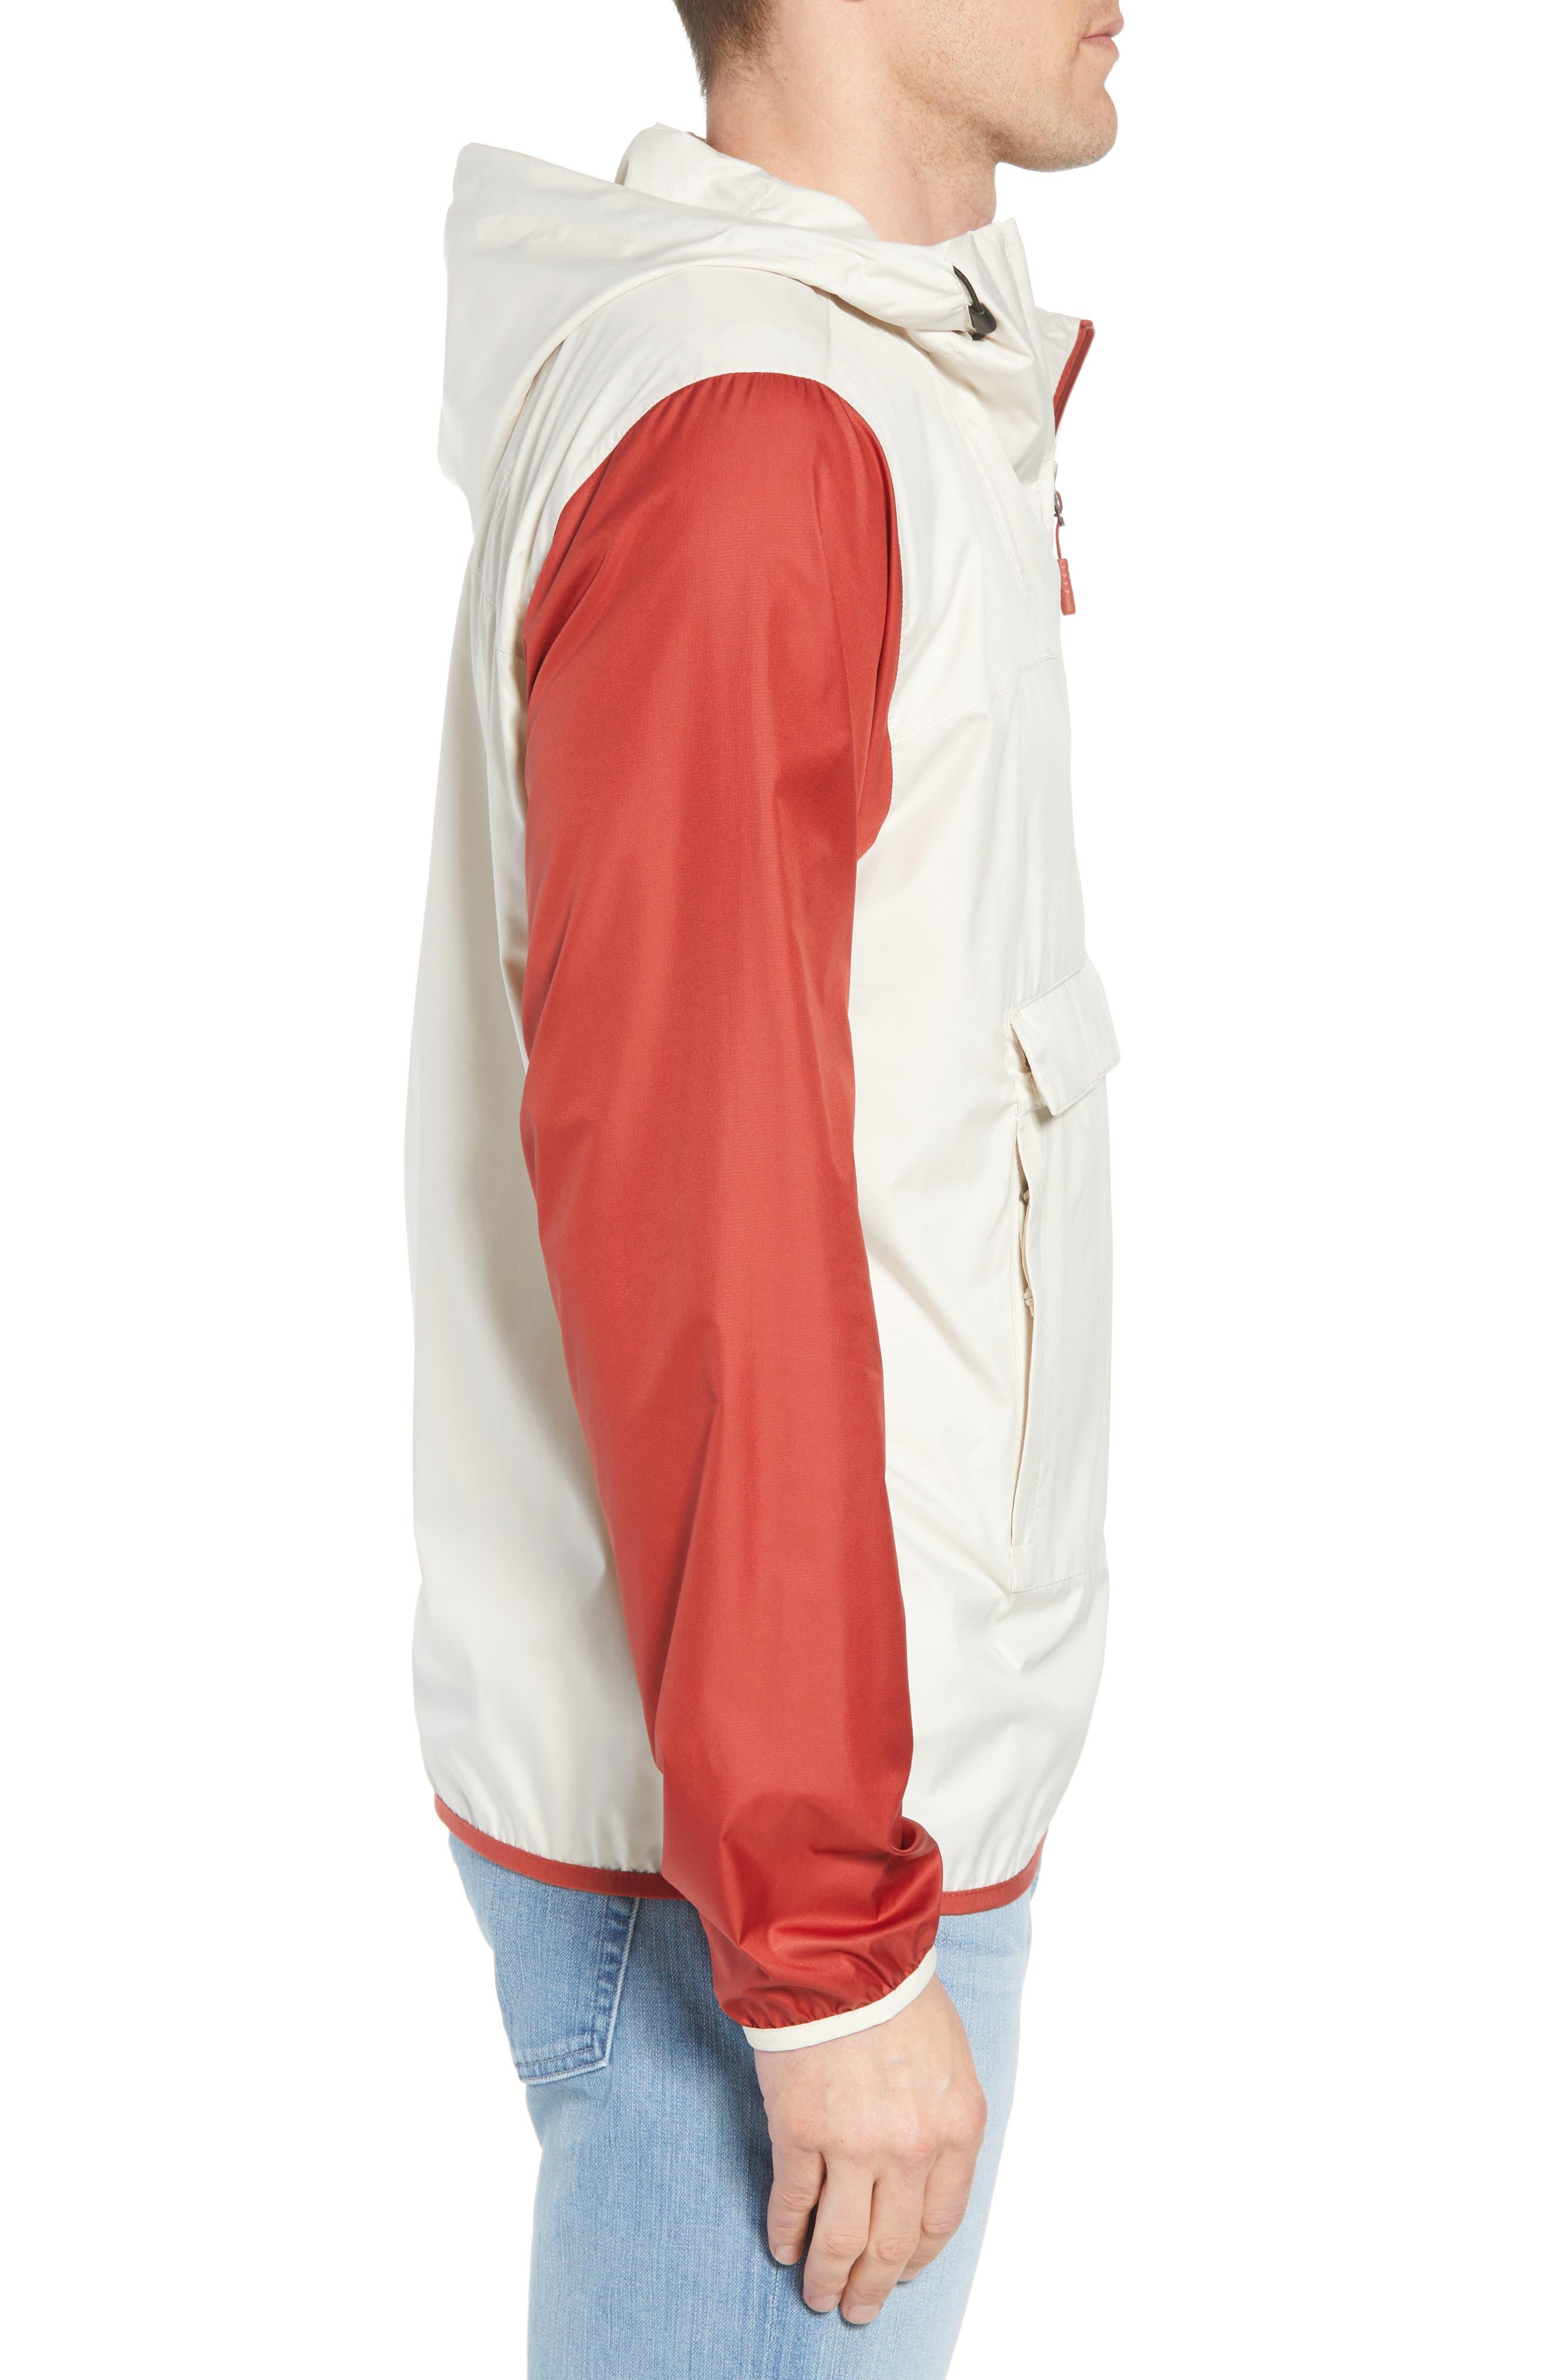 Fanorak Pullover,                             Alternate thumbnail 3, color,                             Vintage White Multi